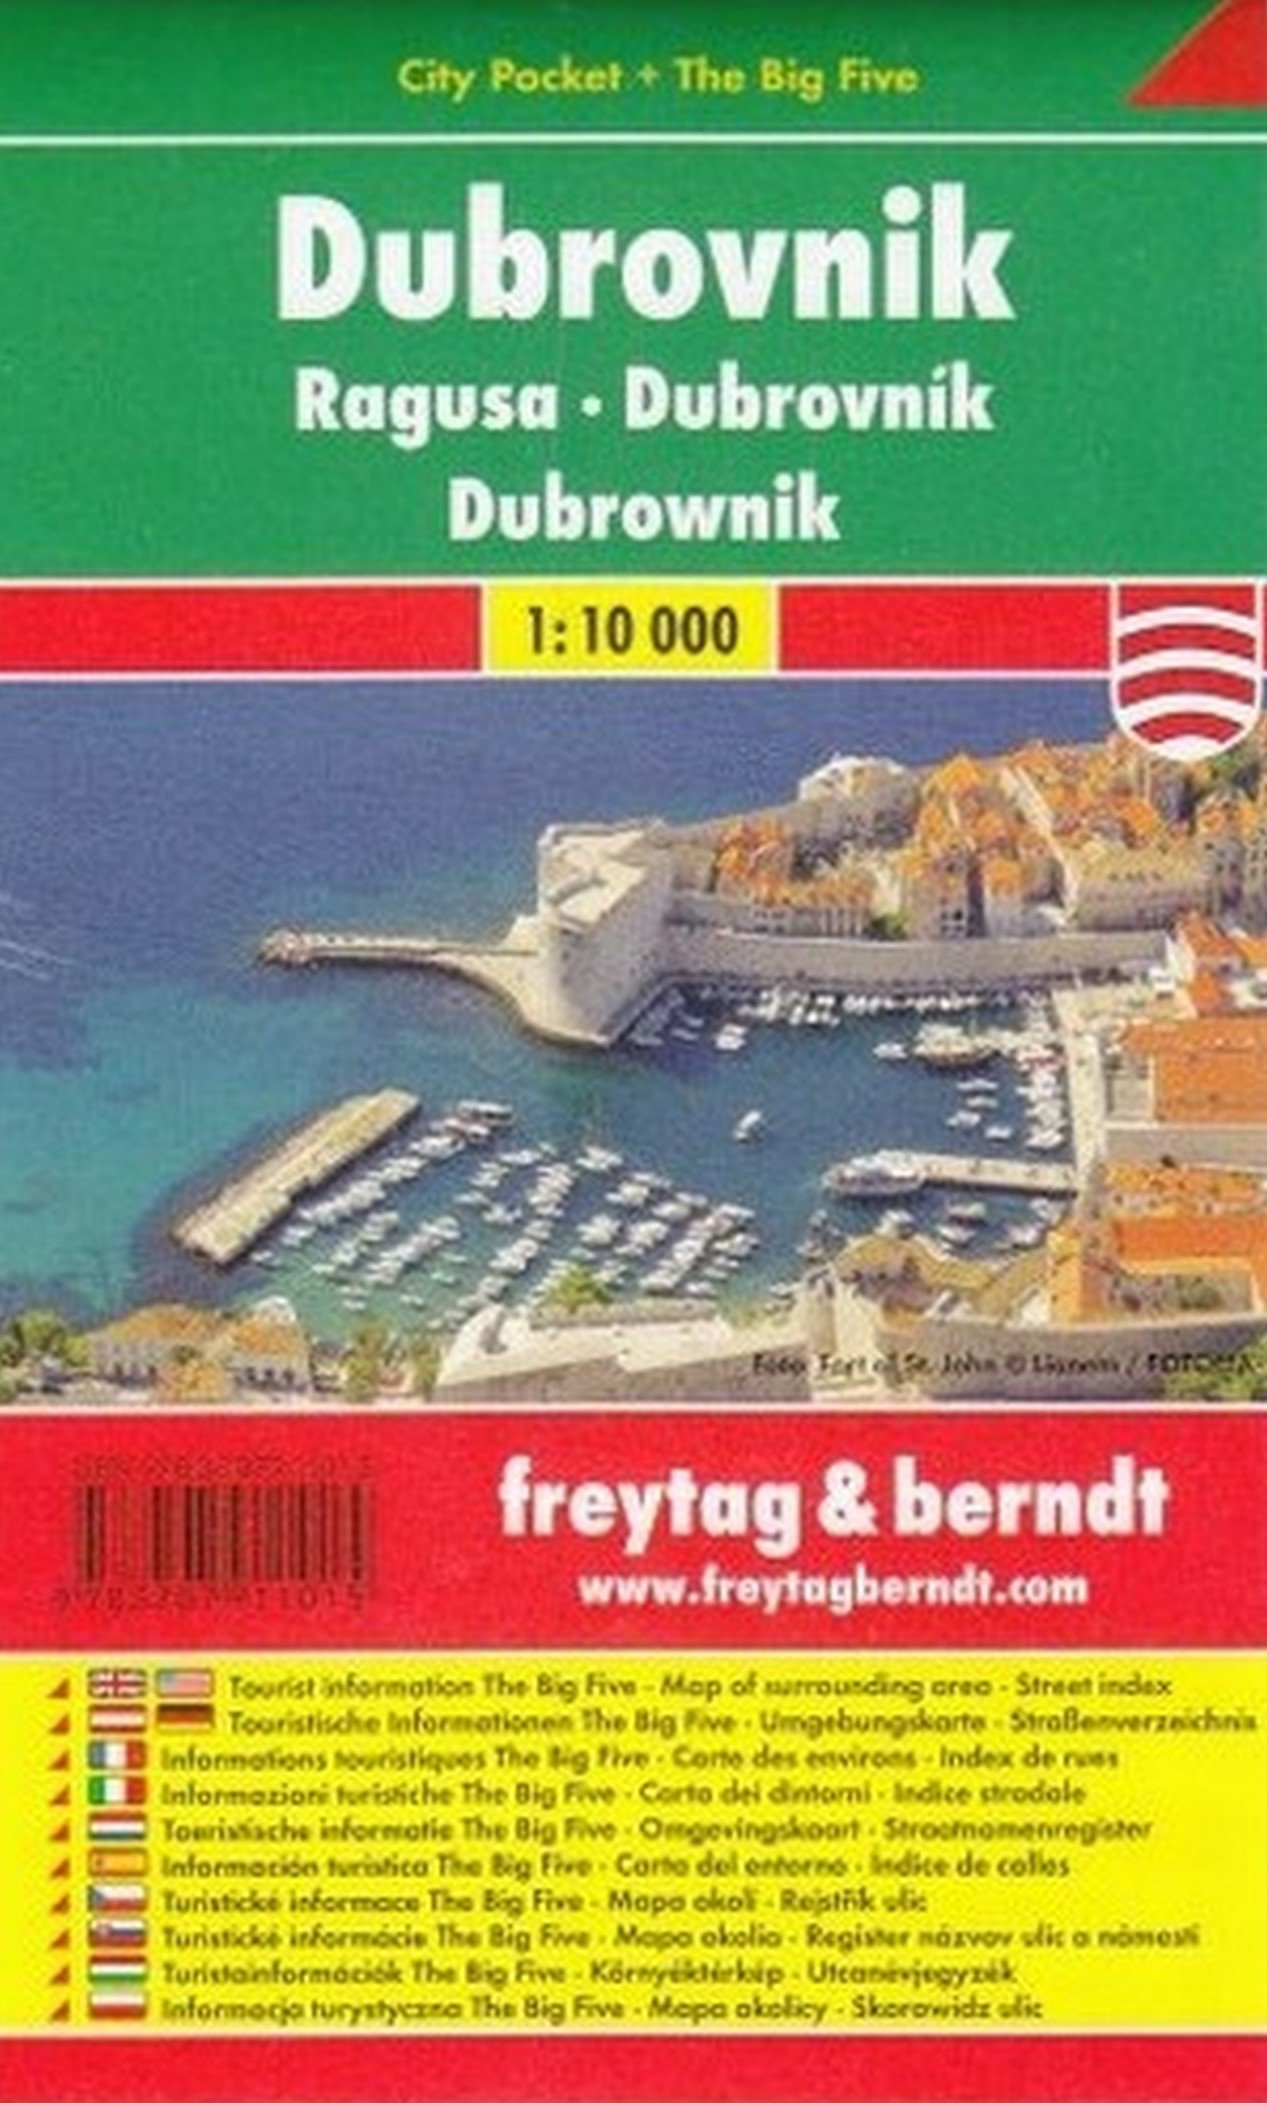 Freytag Berndt Stadtpläne, Dubrovnik, City Pocket + The Big Five - Maßstab 1:10.000